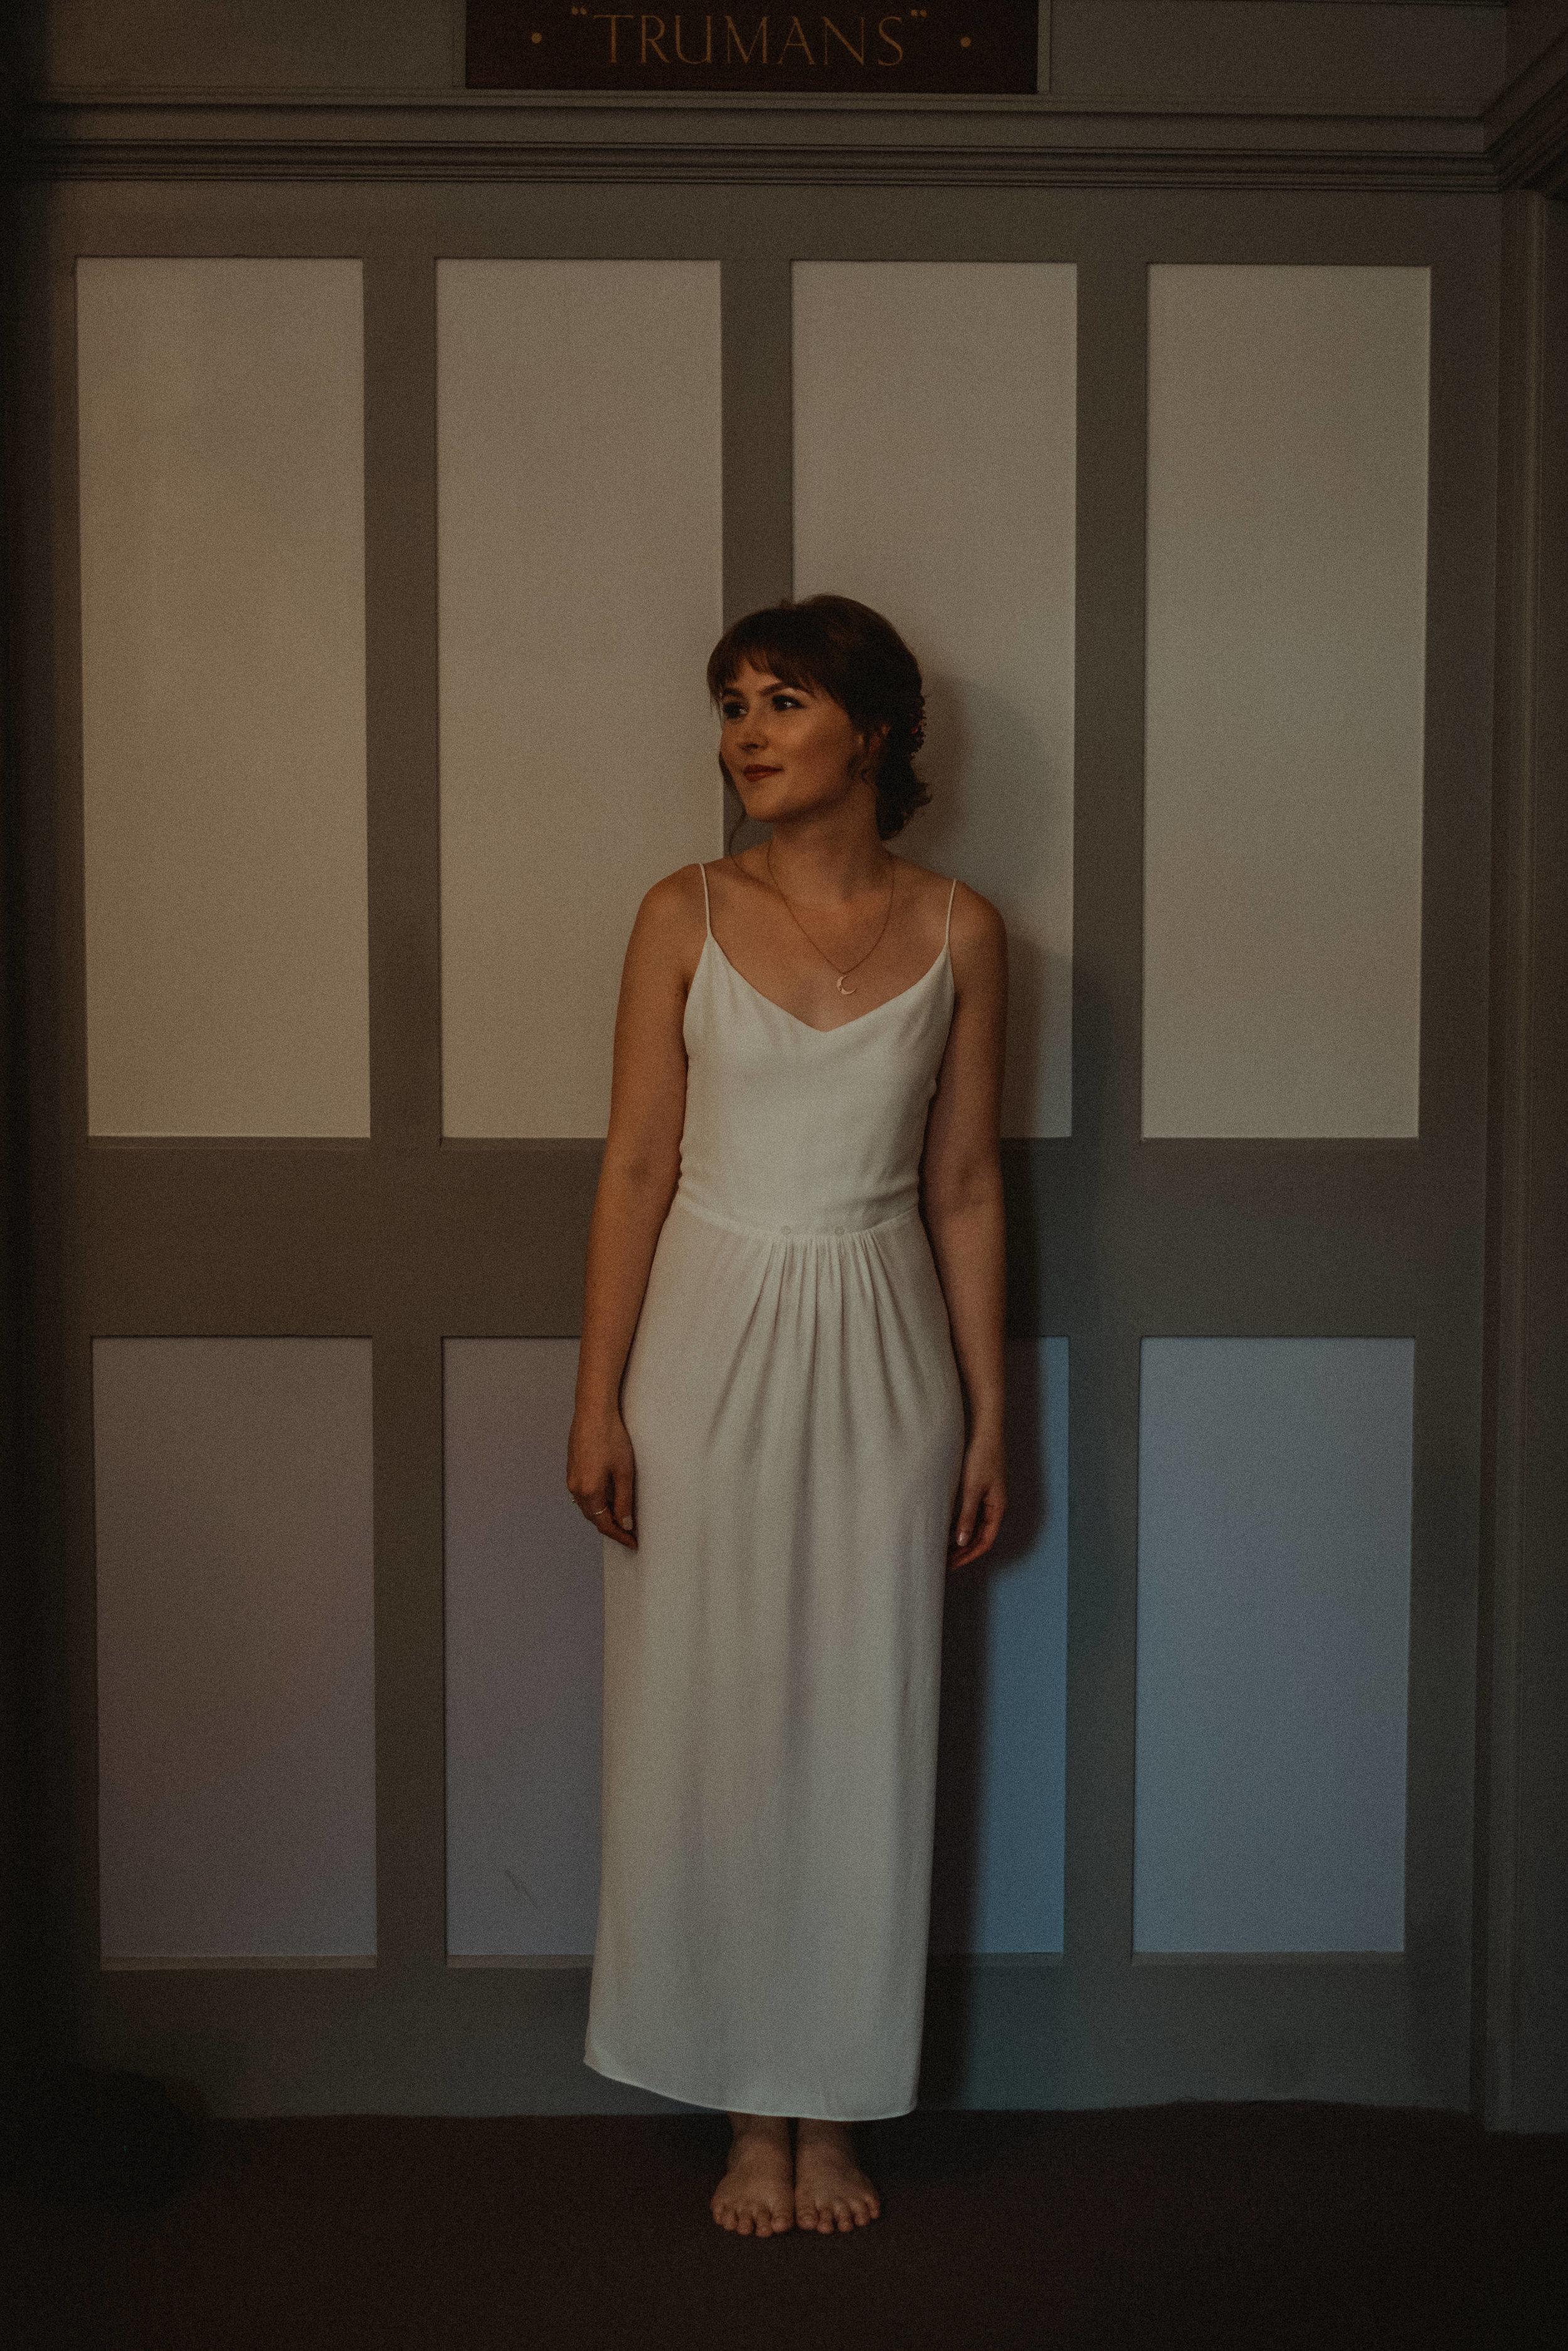 Leanne-London-Bespoke-Backless-Slip-Susanna-Greening-Designs-Matlock-Derbyshire-Wedding-Dress-4